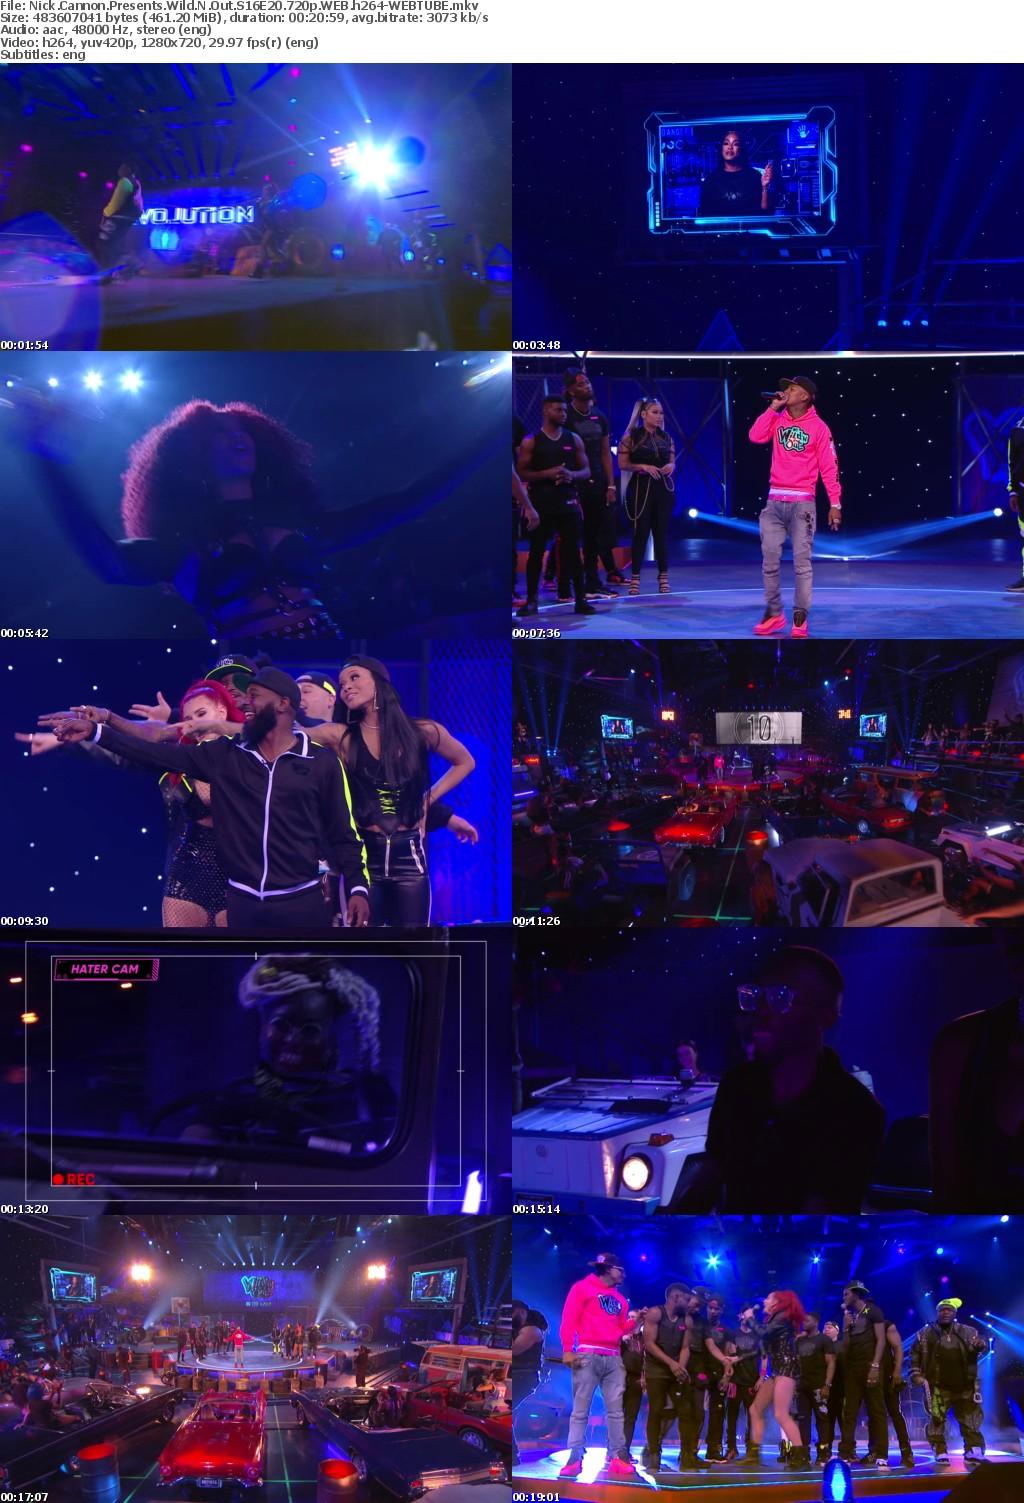 Nick Cannon Presents Wild N Out S16E20 720p WEB h264-WEBTUBE